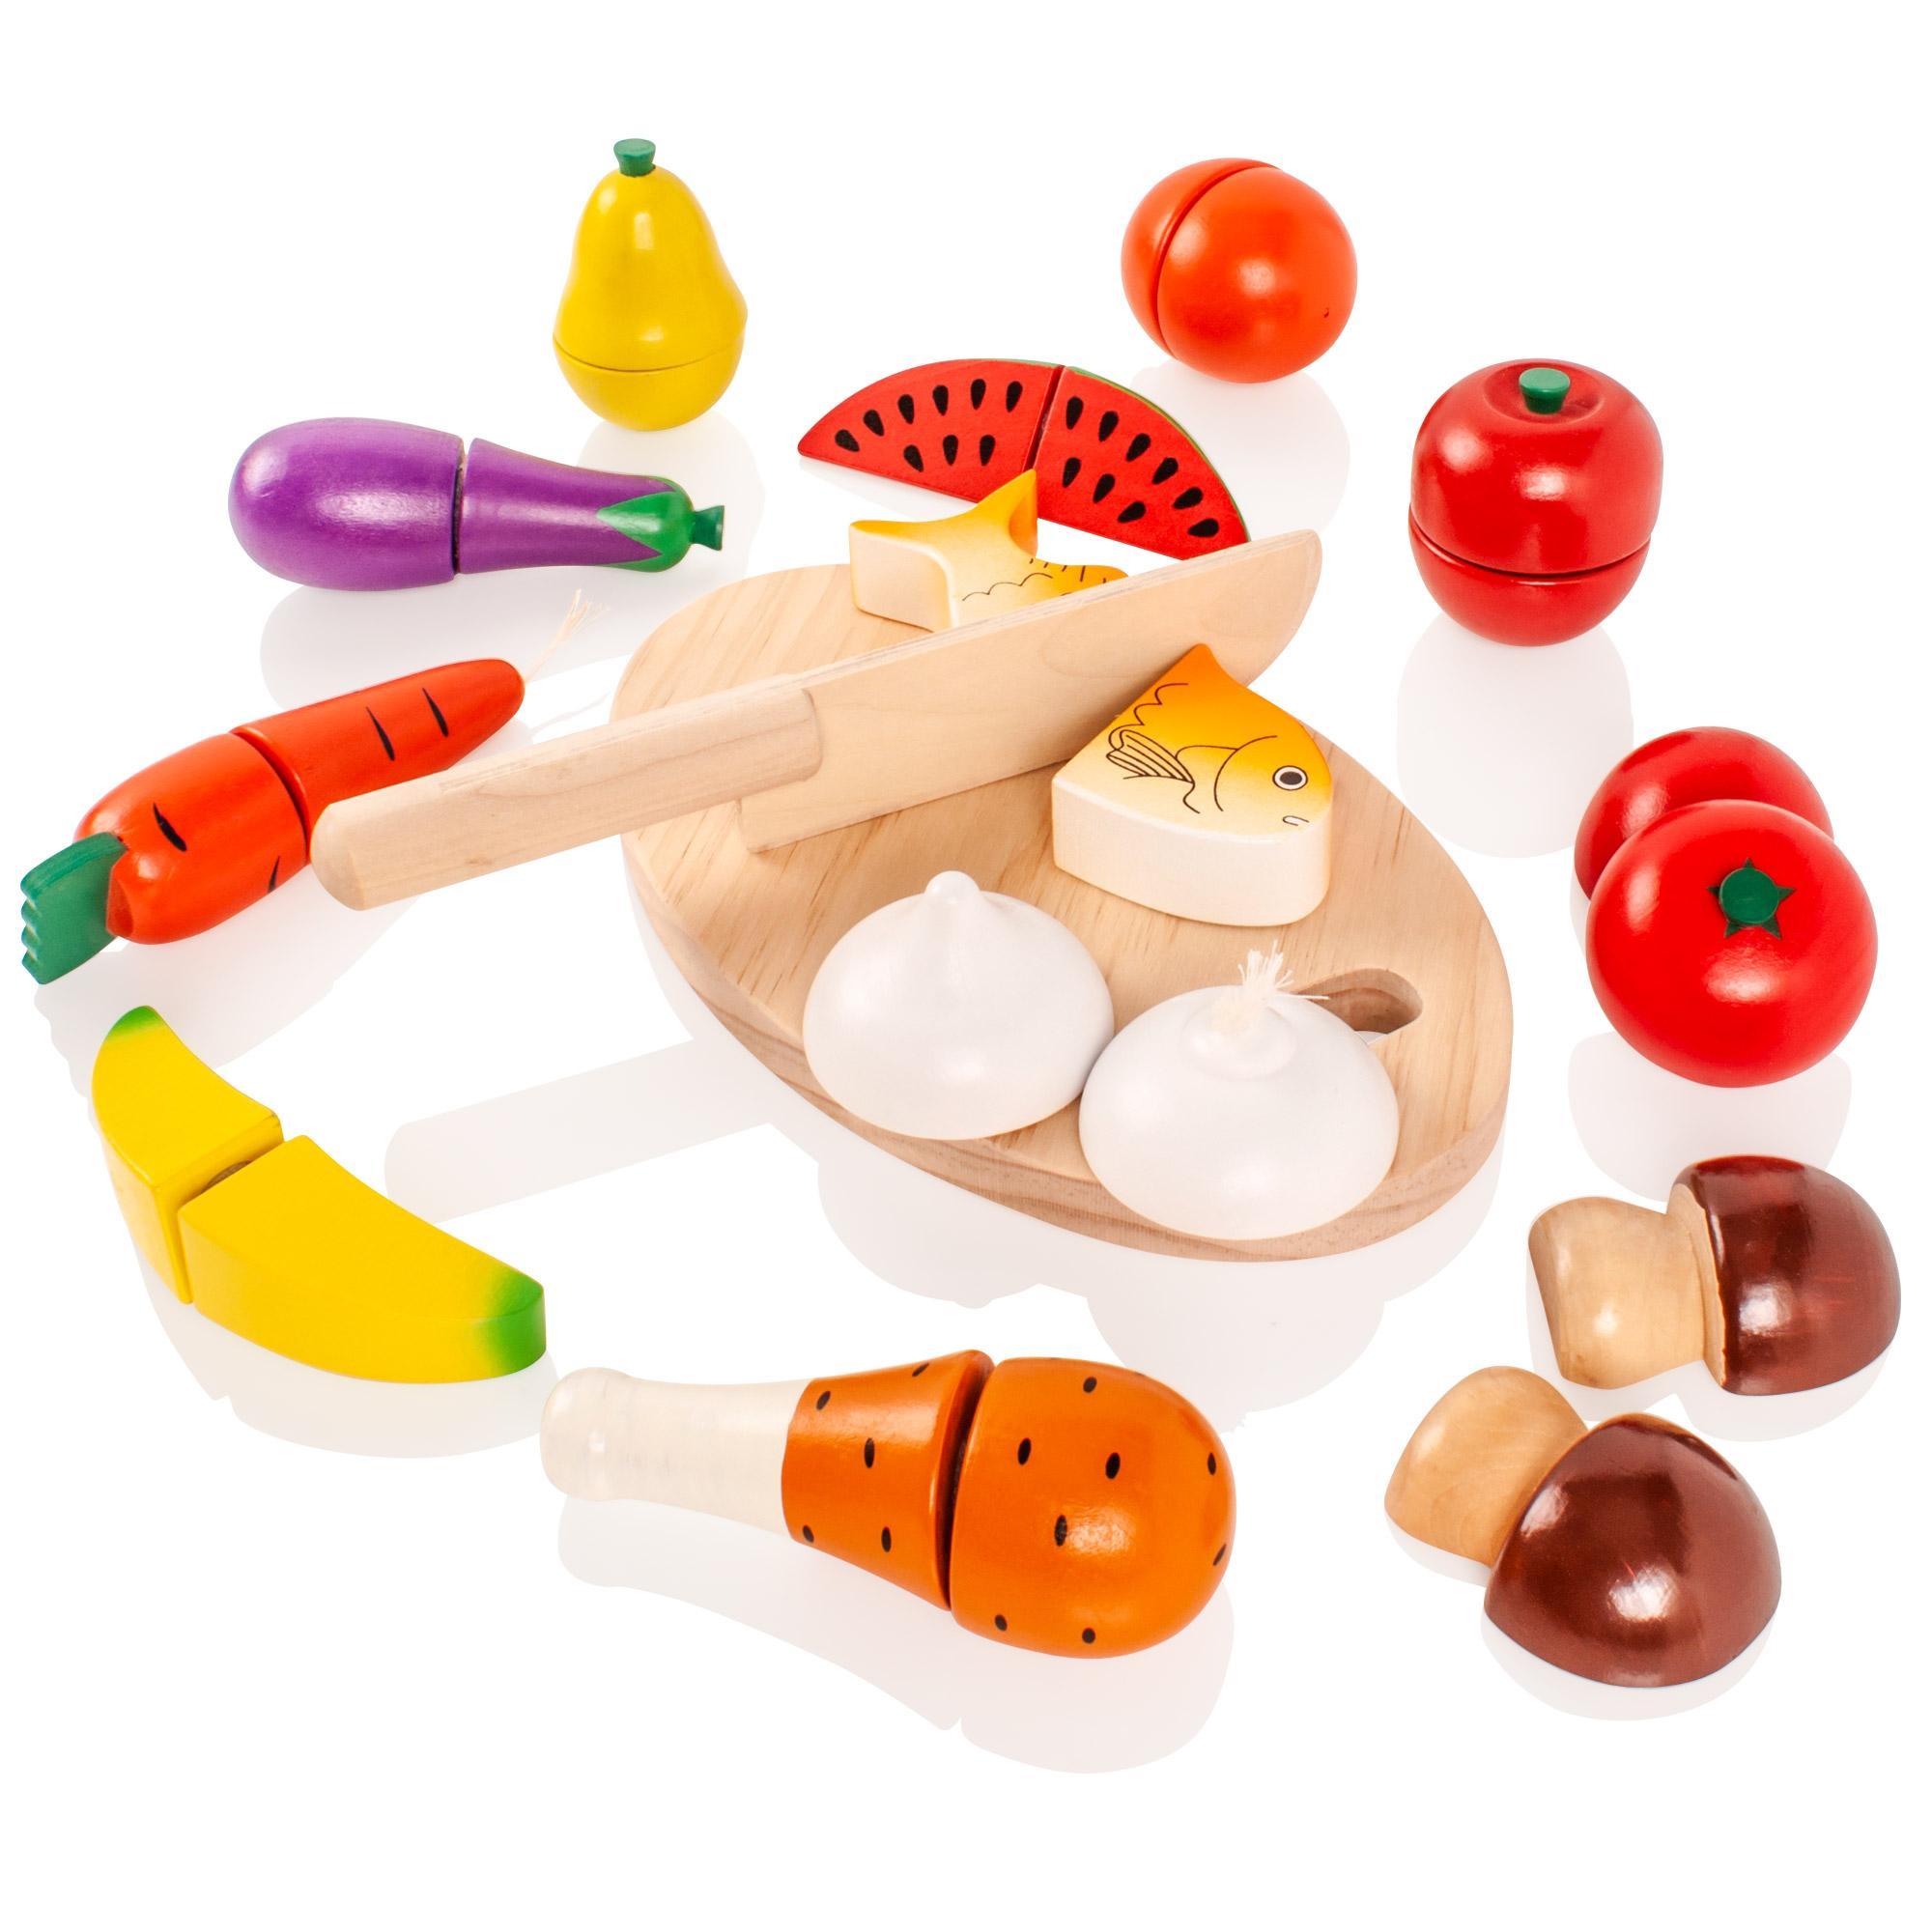 Toy Food Sets : Wooden toy food sets images